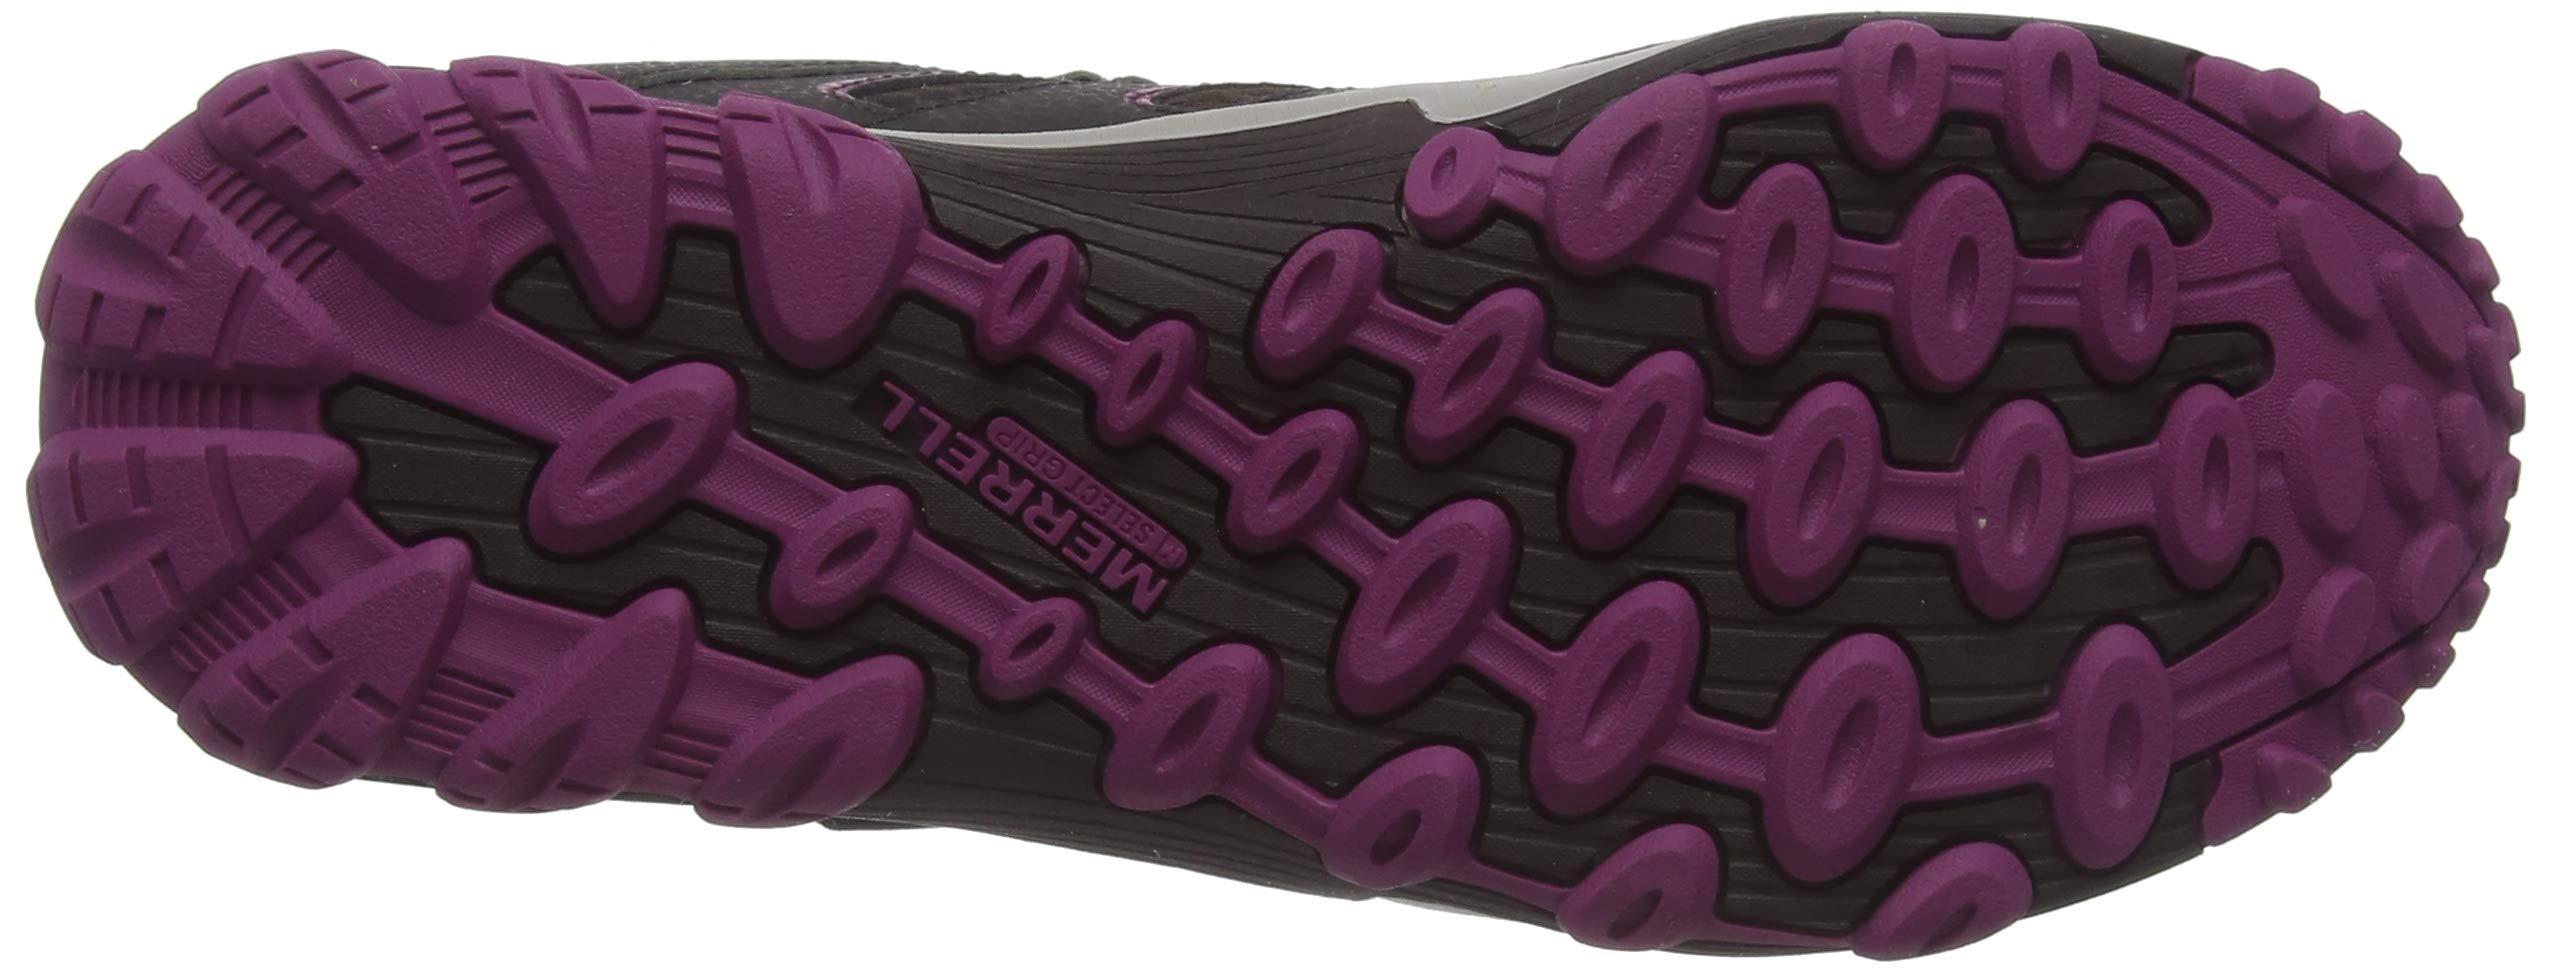 Merrell Unisex Kids M-Chameleon 7 Low a/C Waterproof Rise Hiking Boots 3